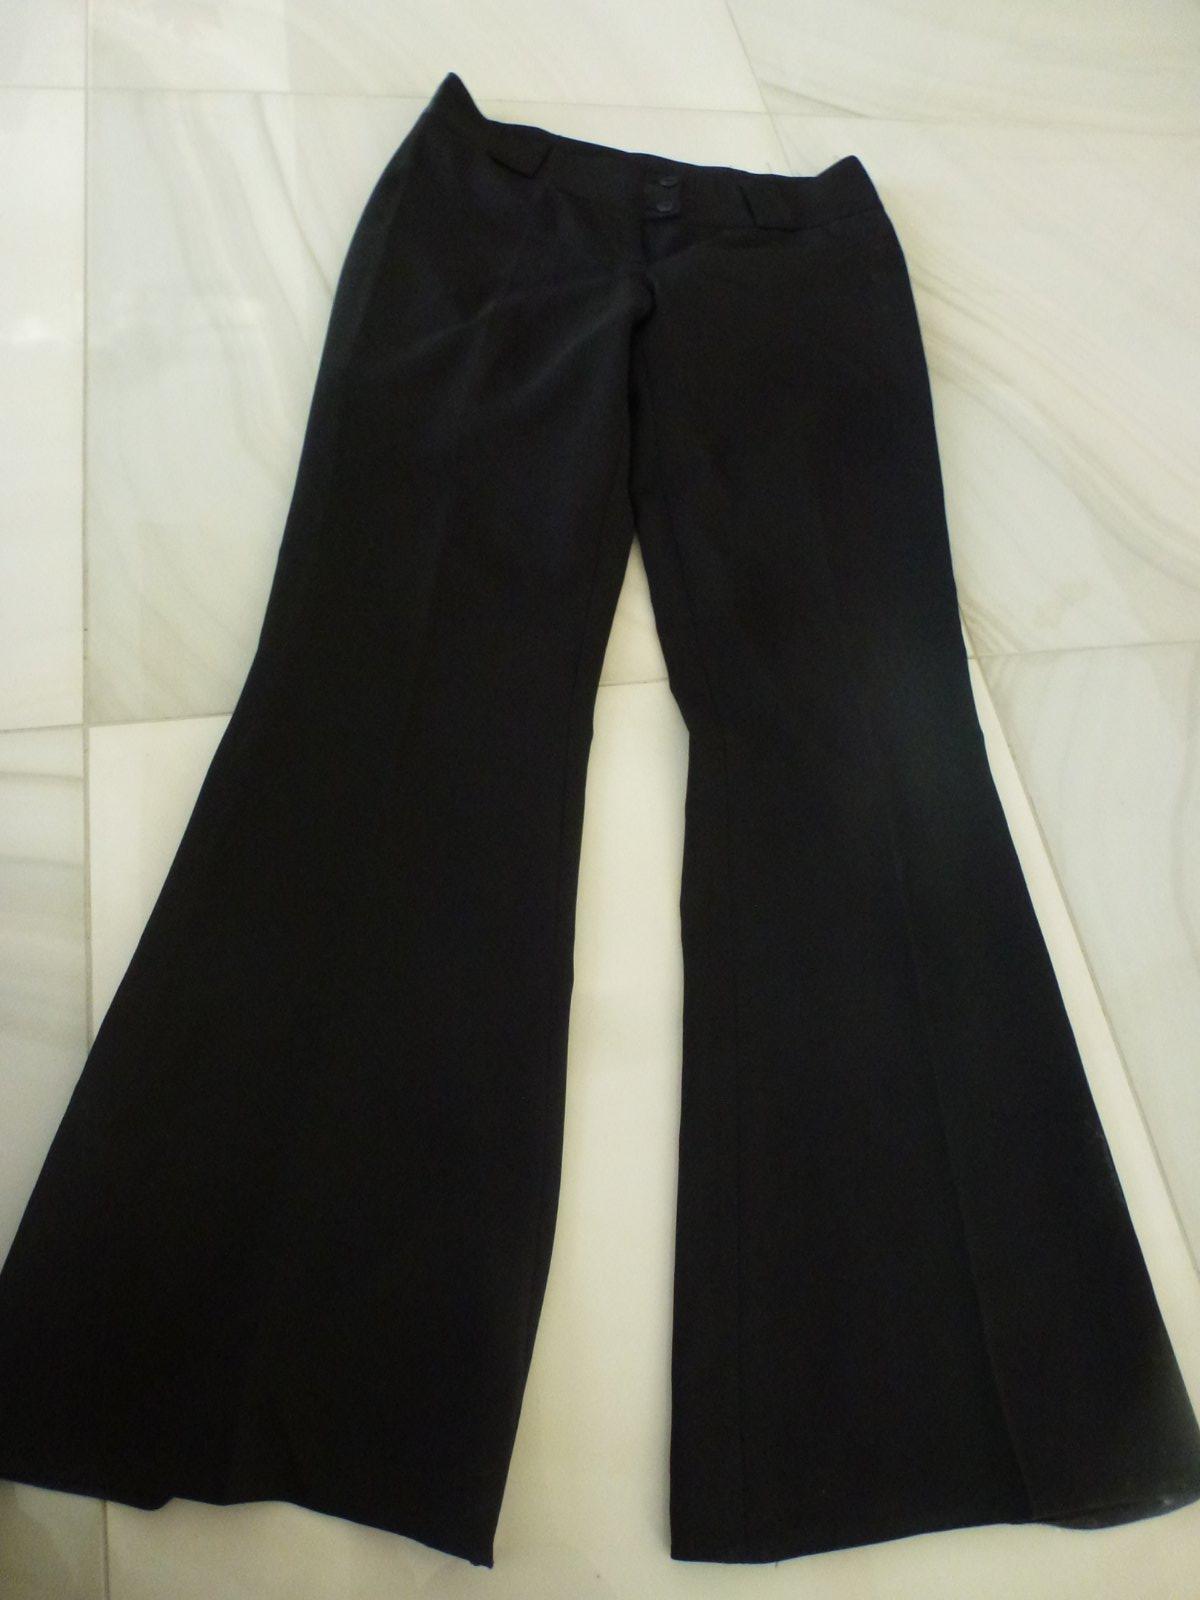 72098ed0c5e8 Čierne elegantné nohavice s pukmi